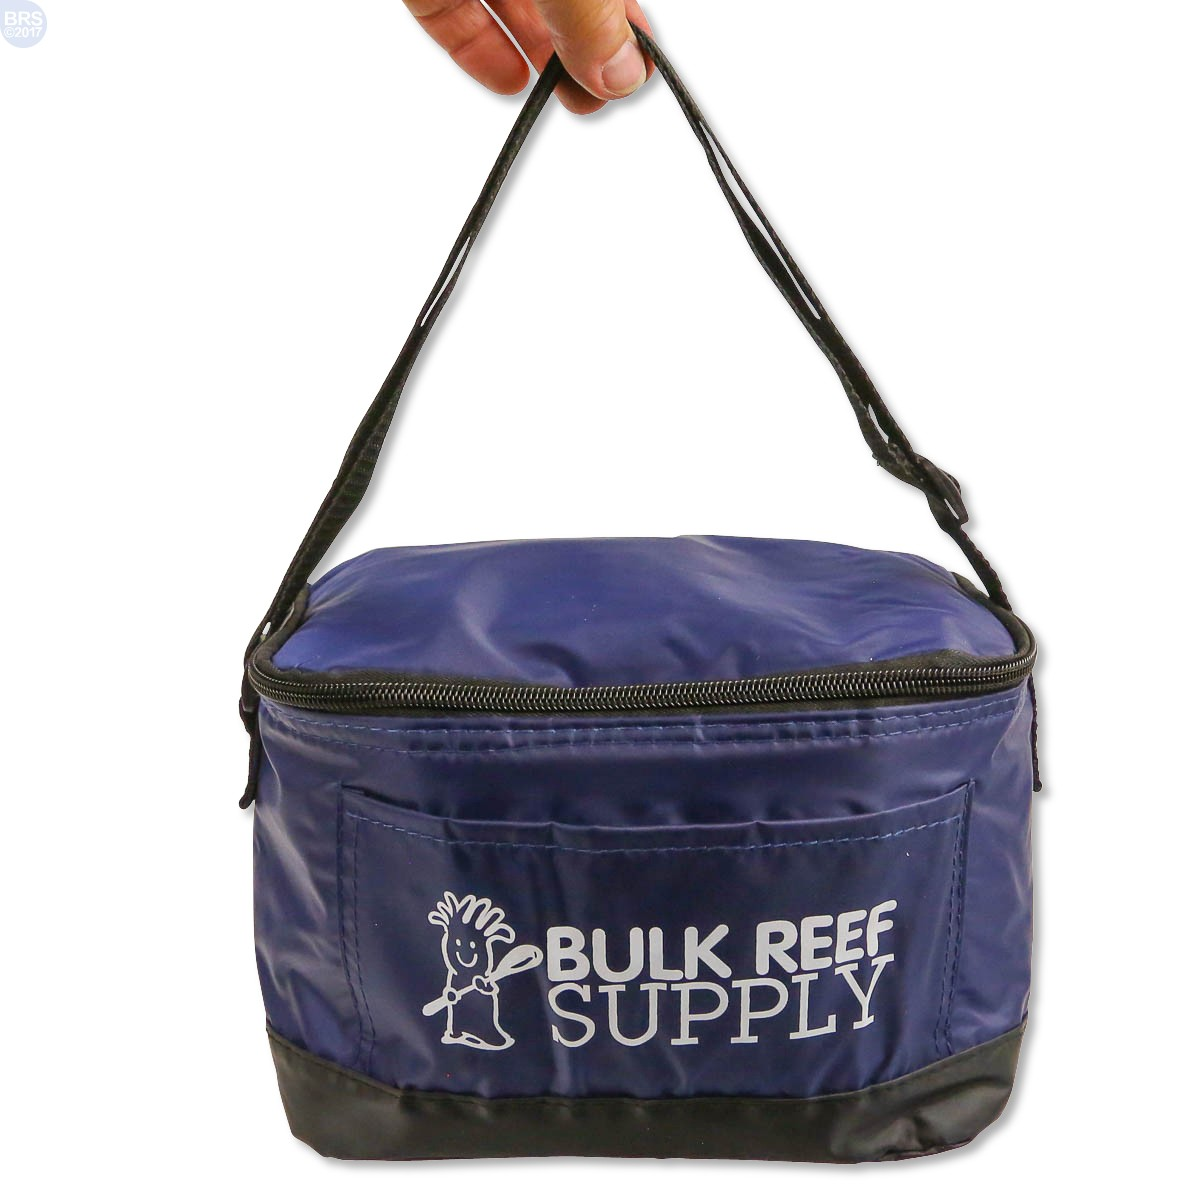 frag transport insulated cooler bag brs - Insulated Cooler Bags